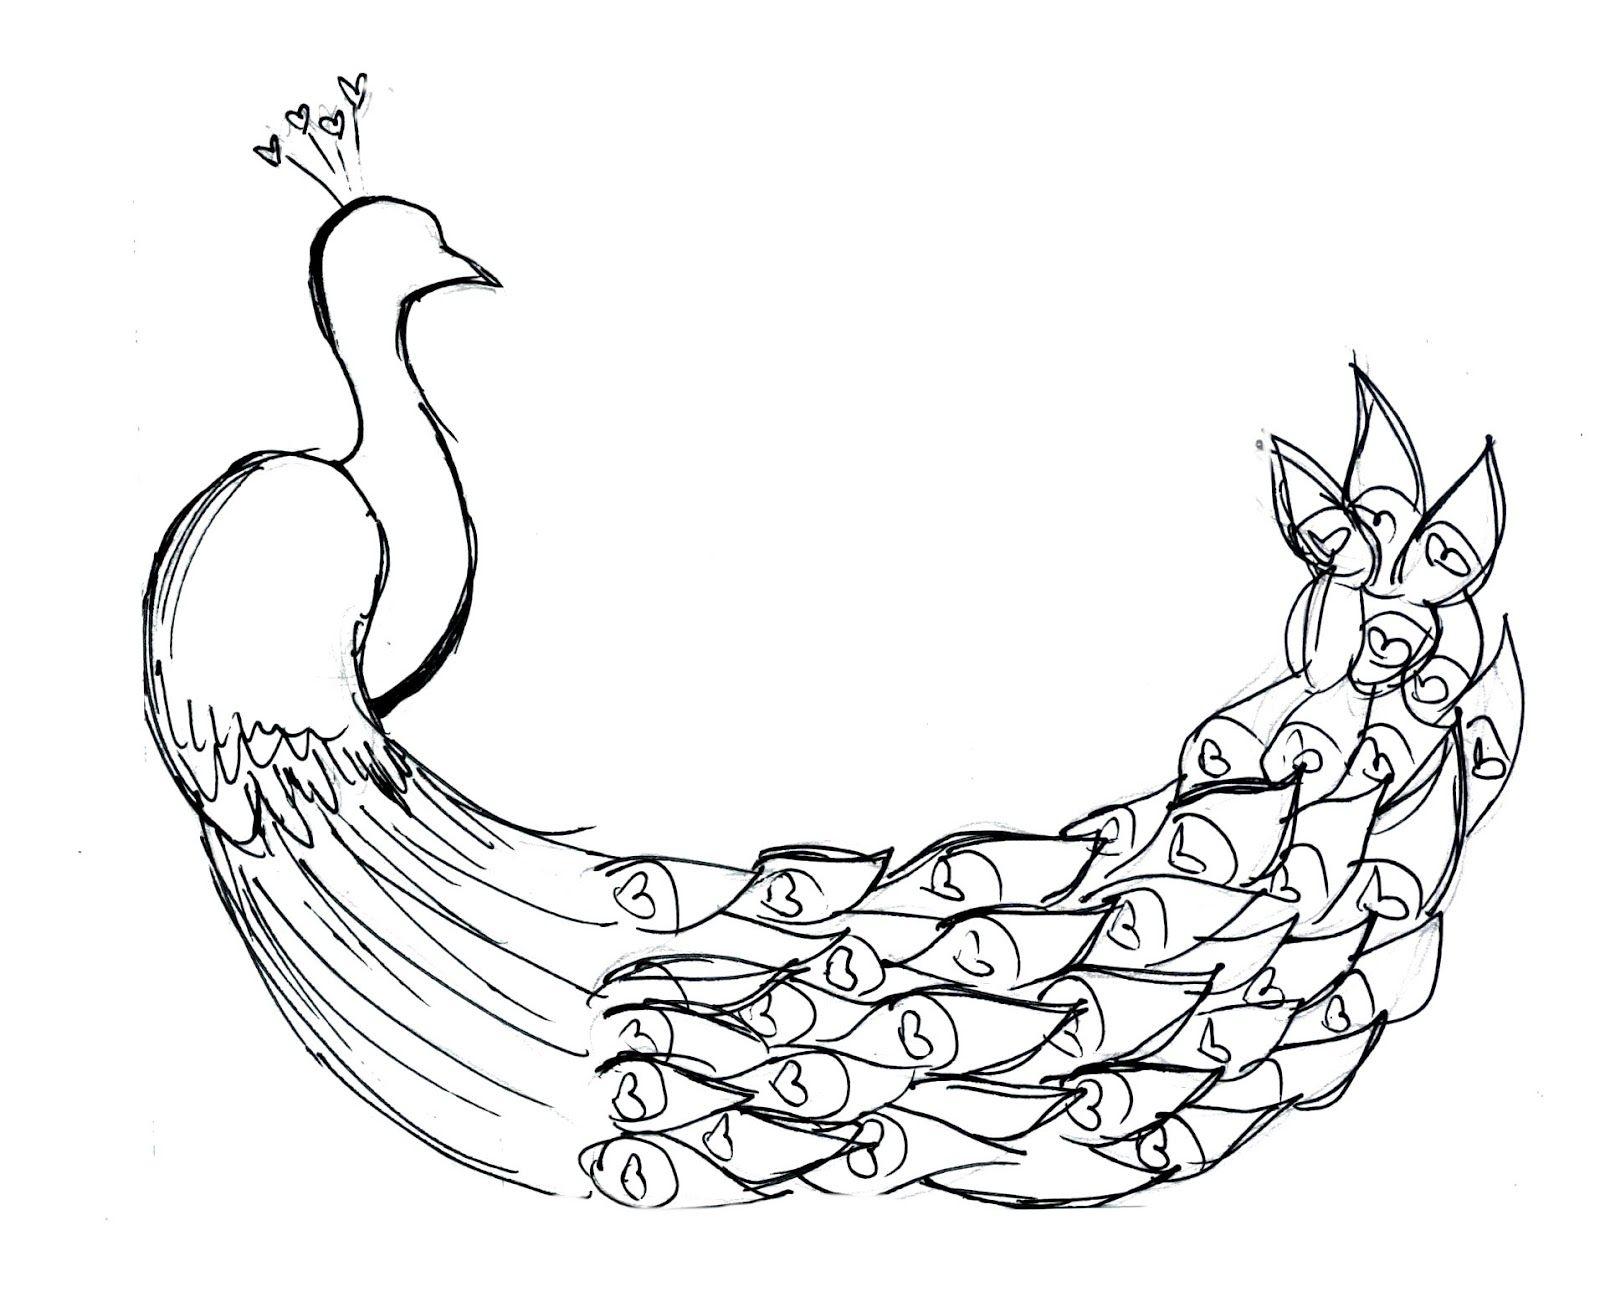 http://4.bp.blogspot.com/-BKKhwOTQ9qk/T8aHLEDJQTI/AAAAAAAAASw/vXoOSkN-xJQ/s1600/peacock+sketch.jpg